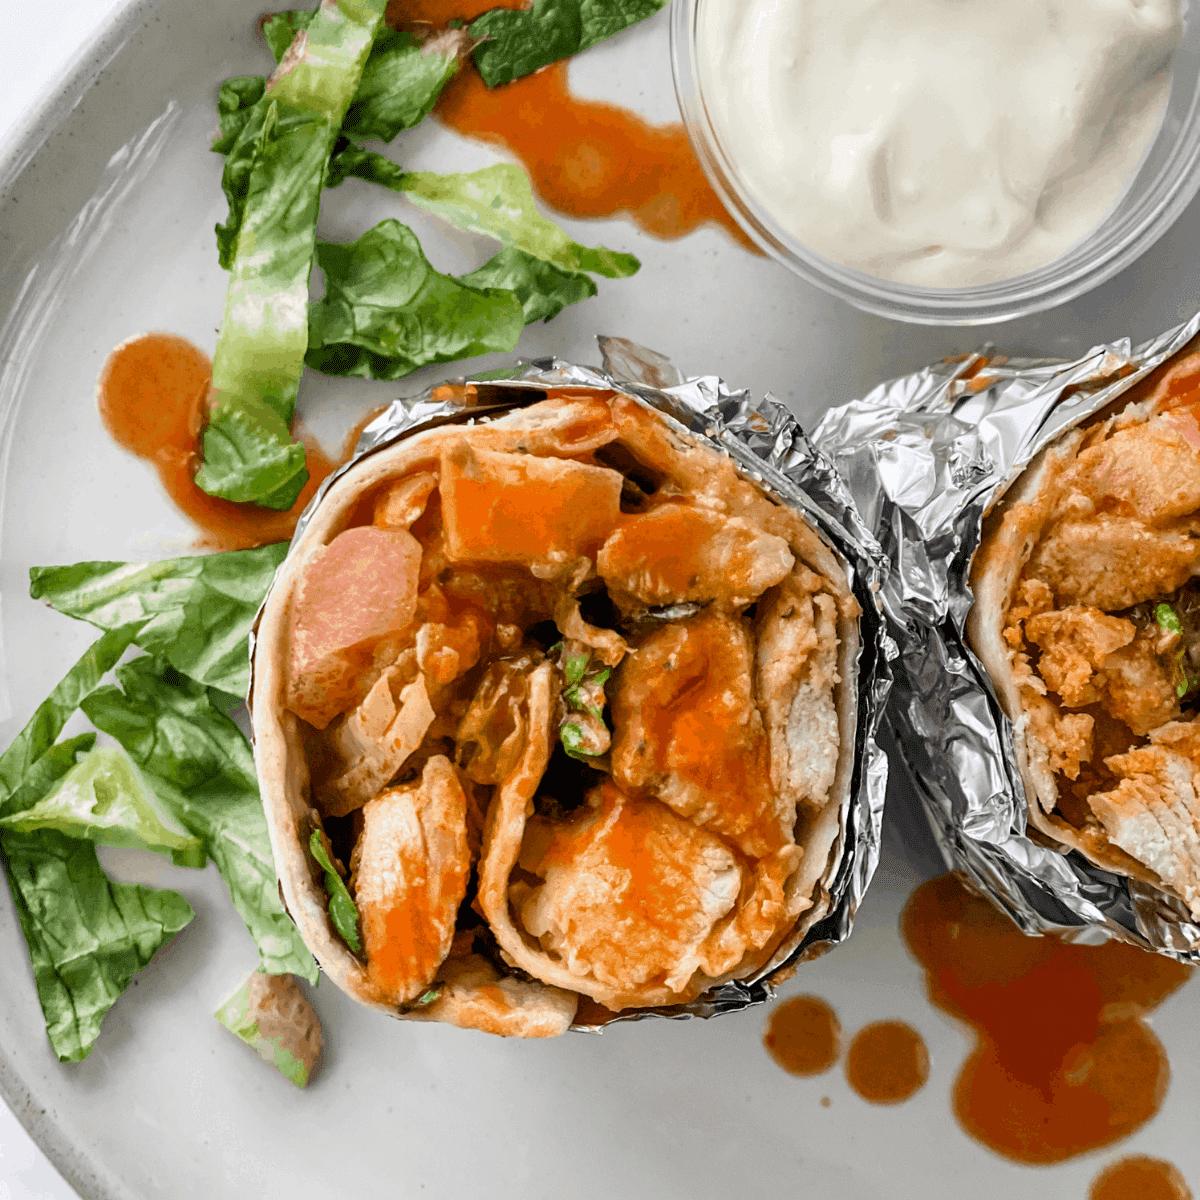 Buffalo chicken wrap on a plate